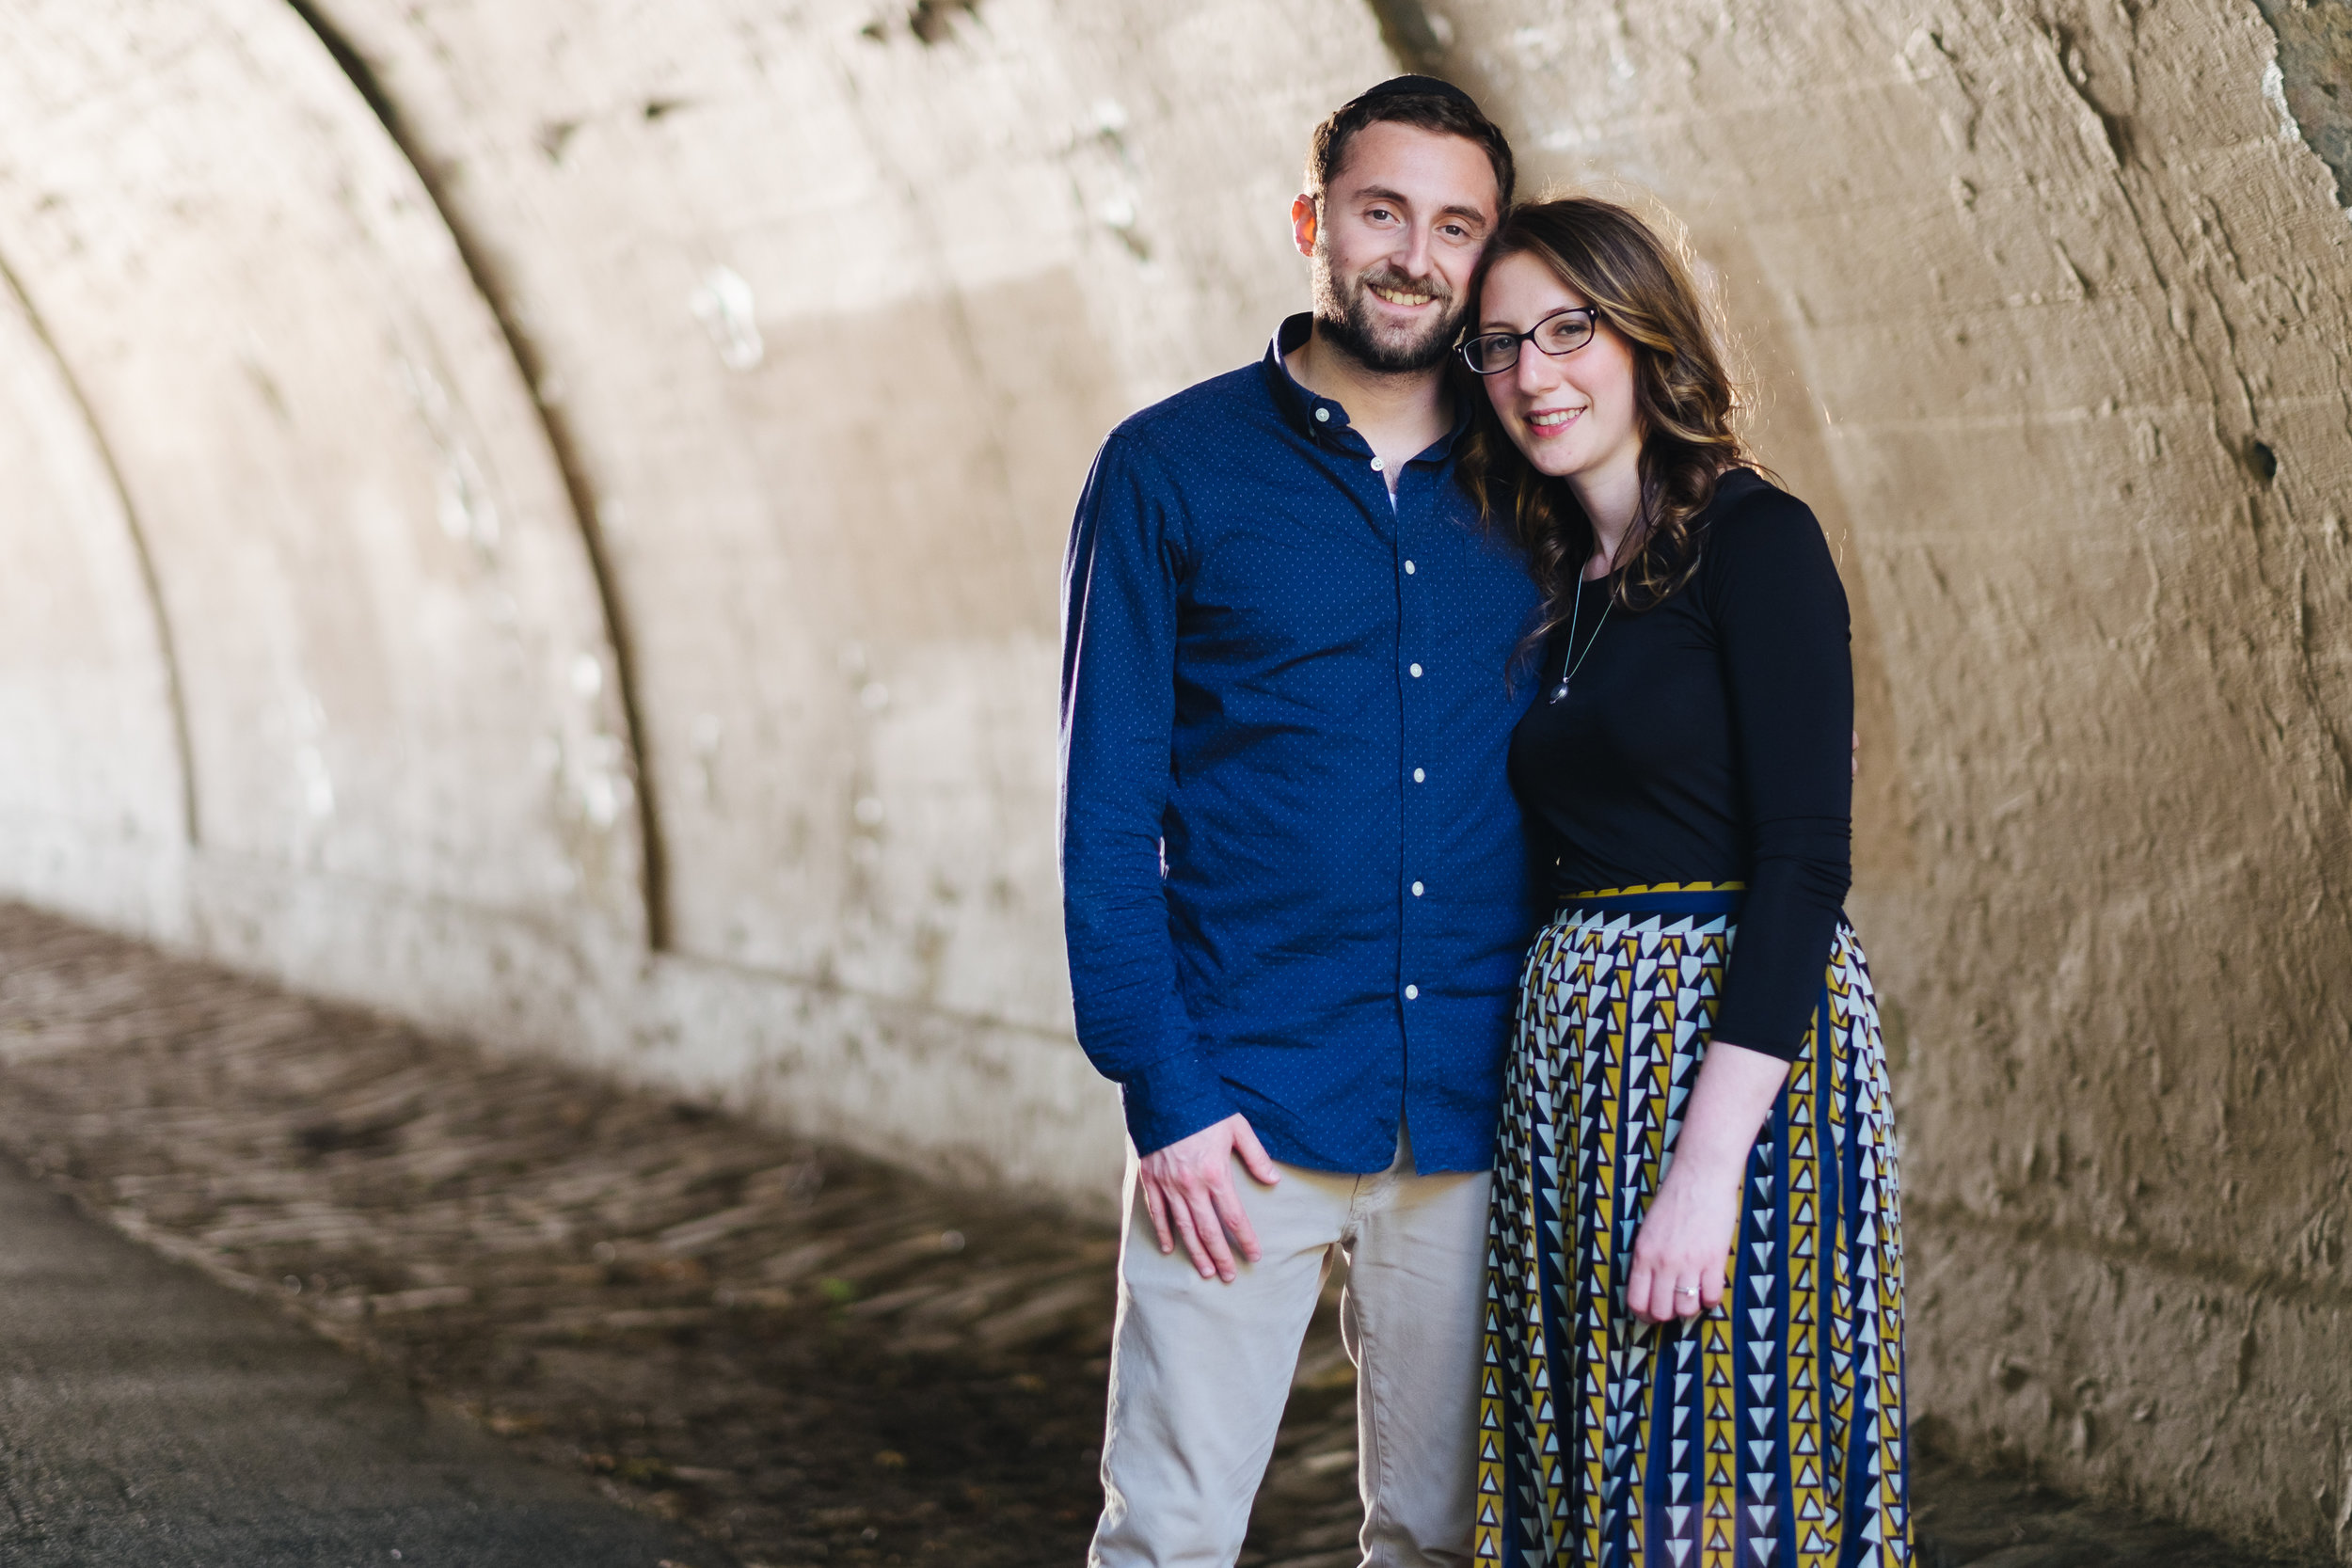 Engagement session - Michael & Sarah - Eliau Piha studio photography-0037.jpg